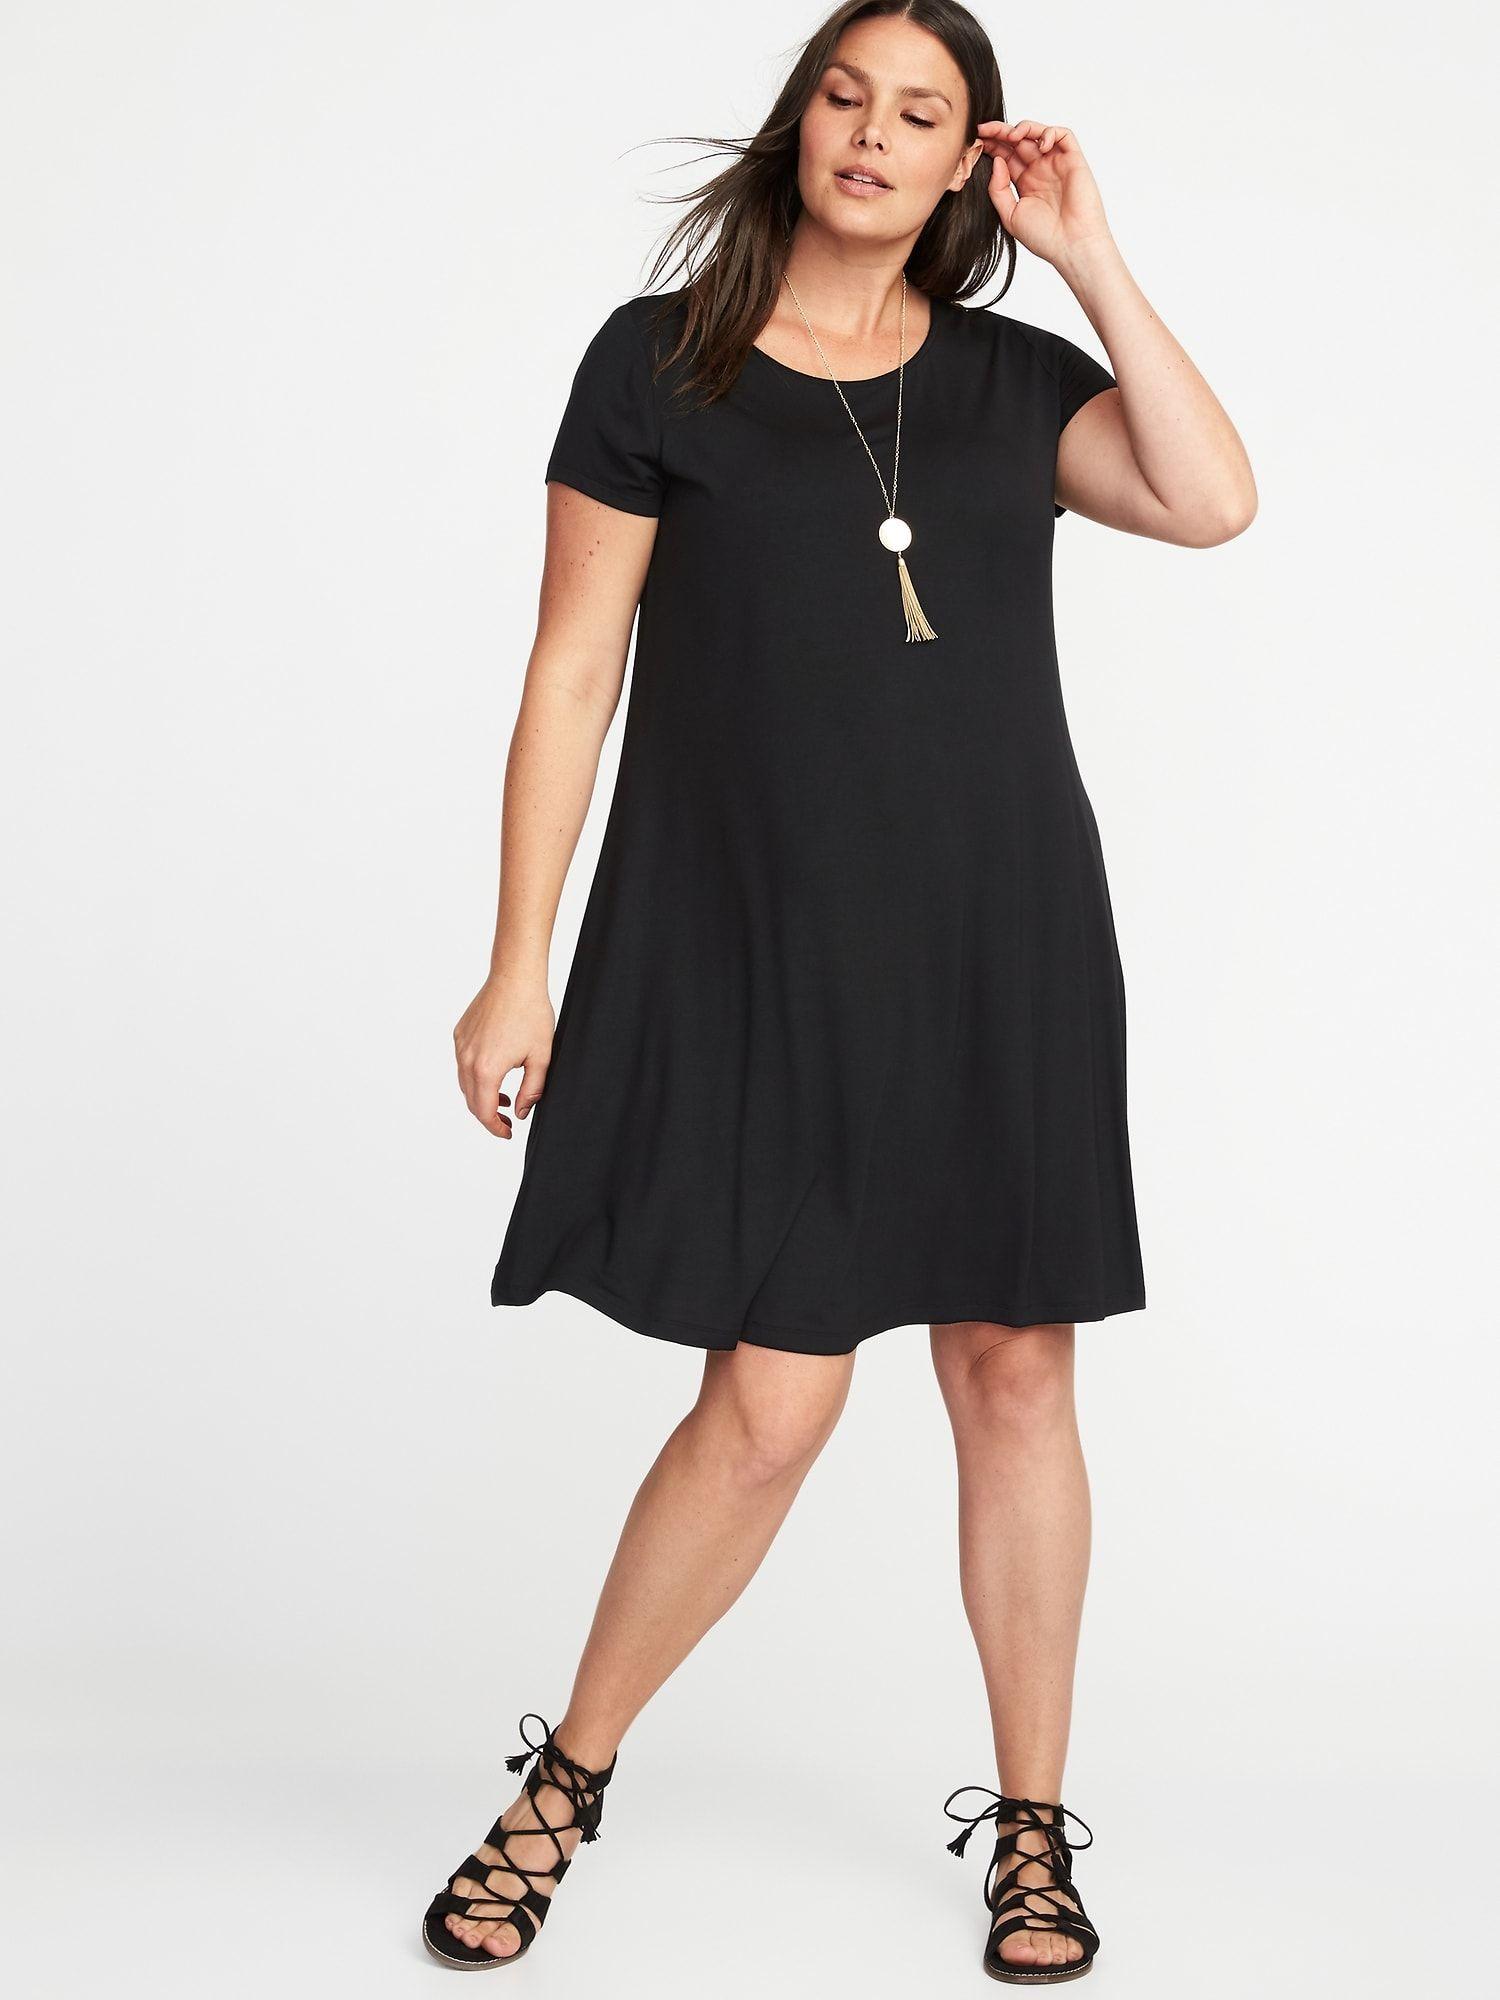 15++ Old navy black dress ideas ideas